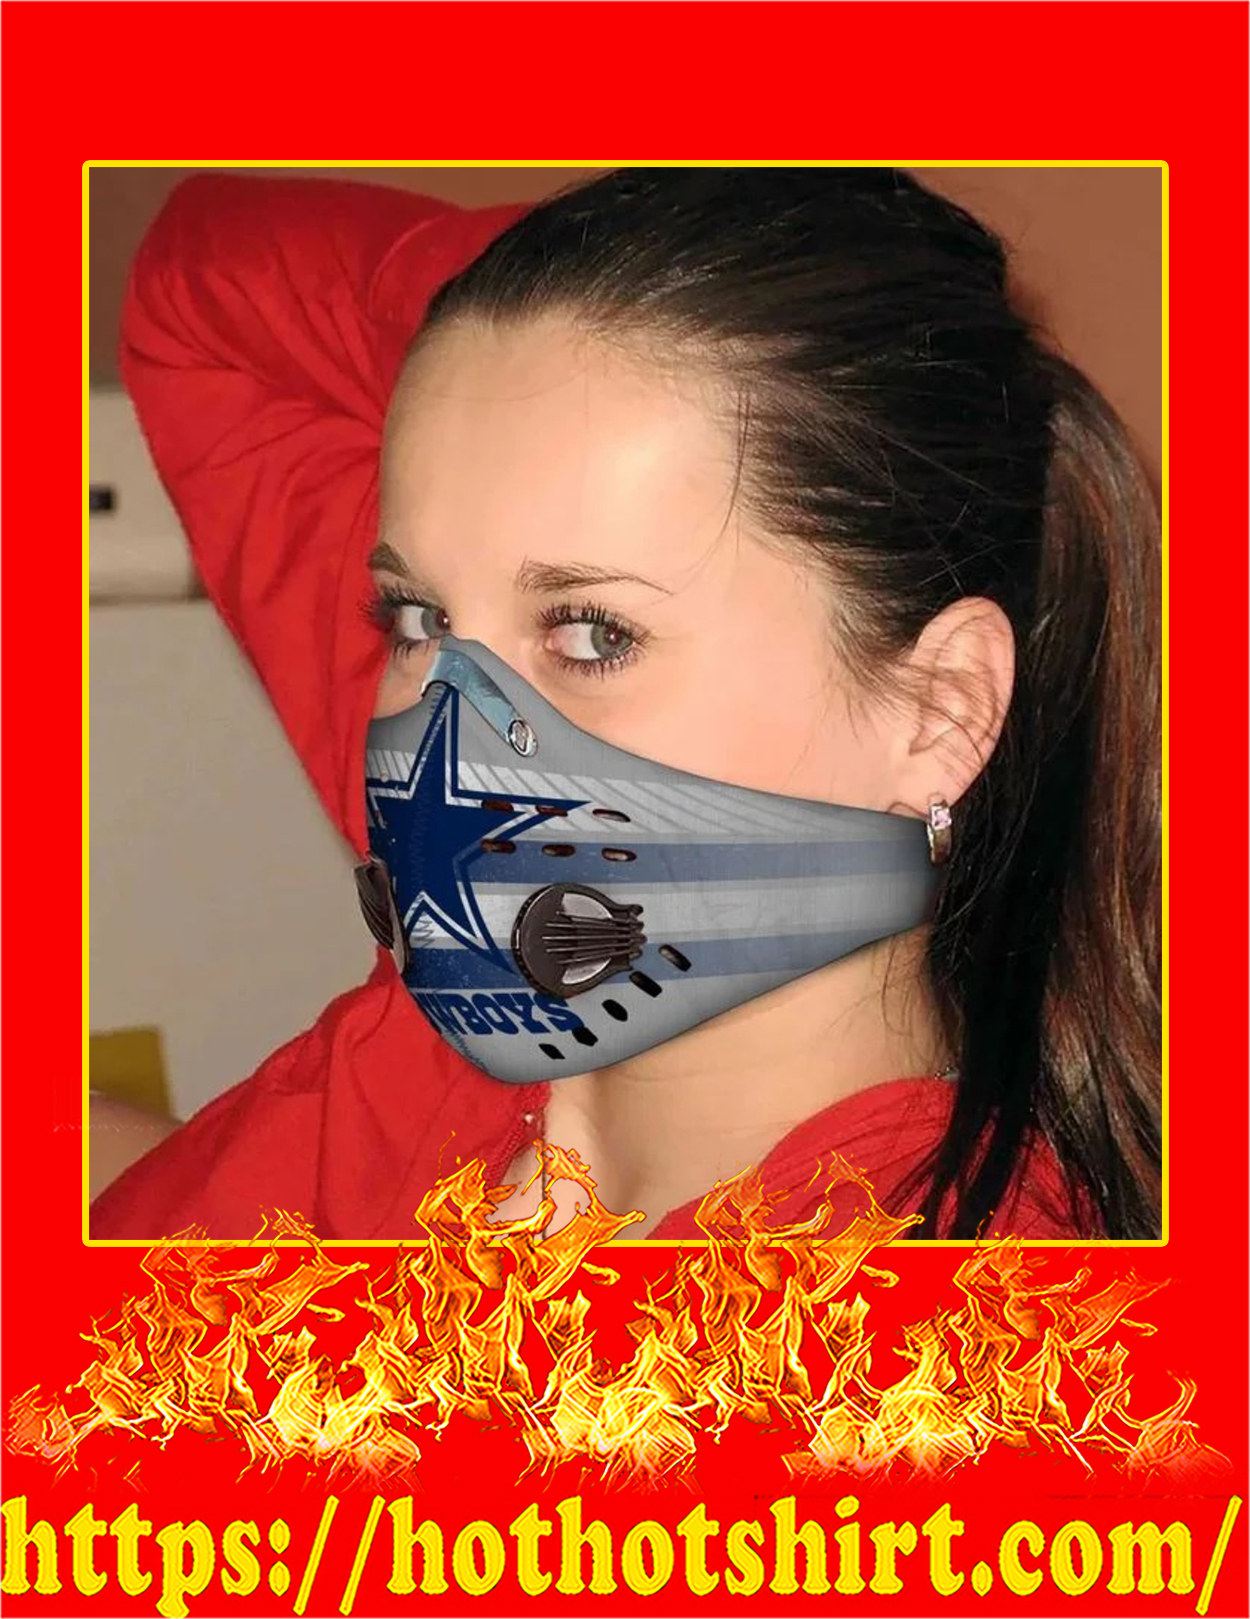 Dallas cowboys filter face mask - Pic 1